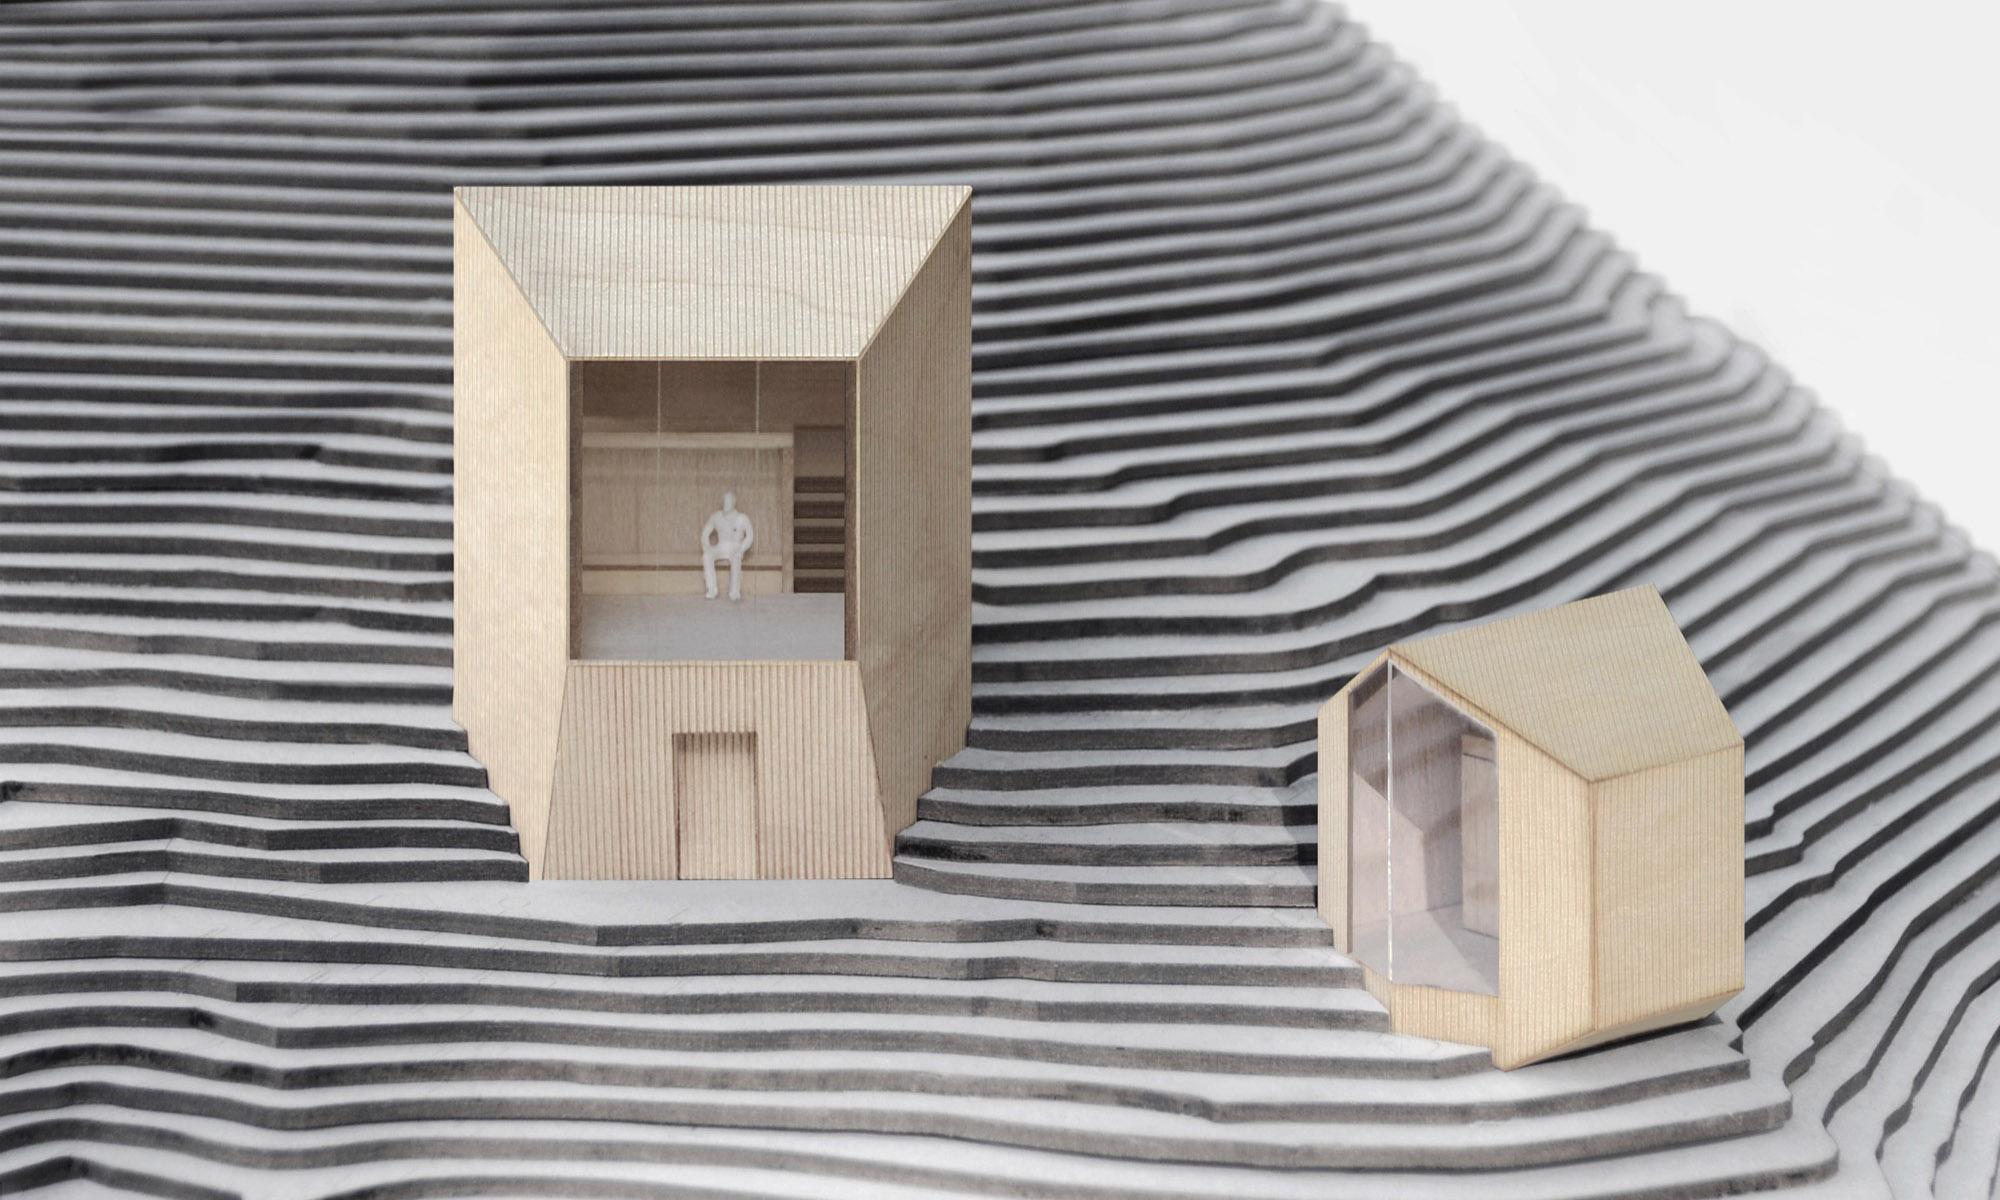 reiulf-ramstad-architects-3